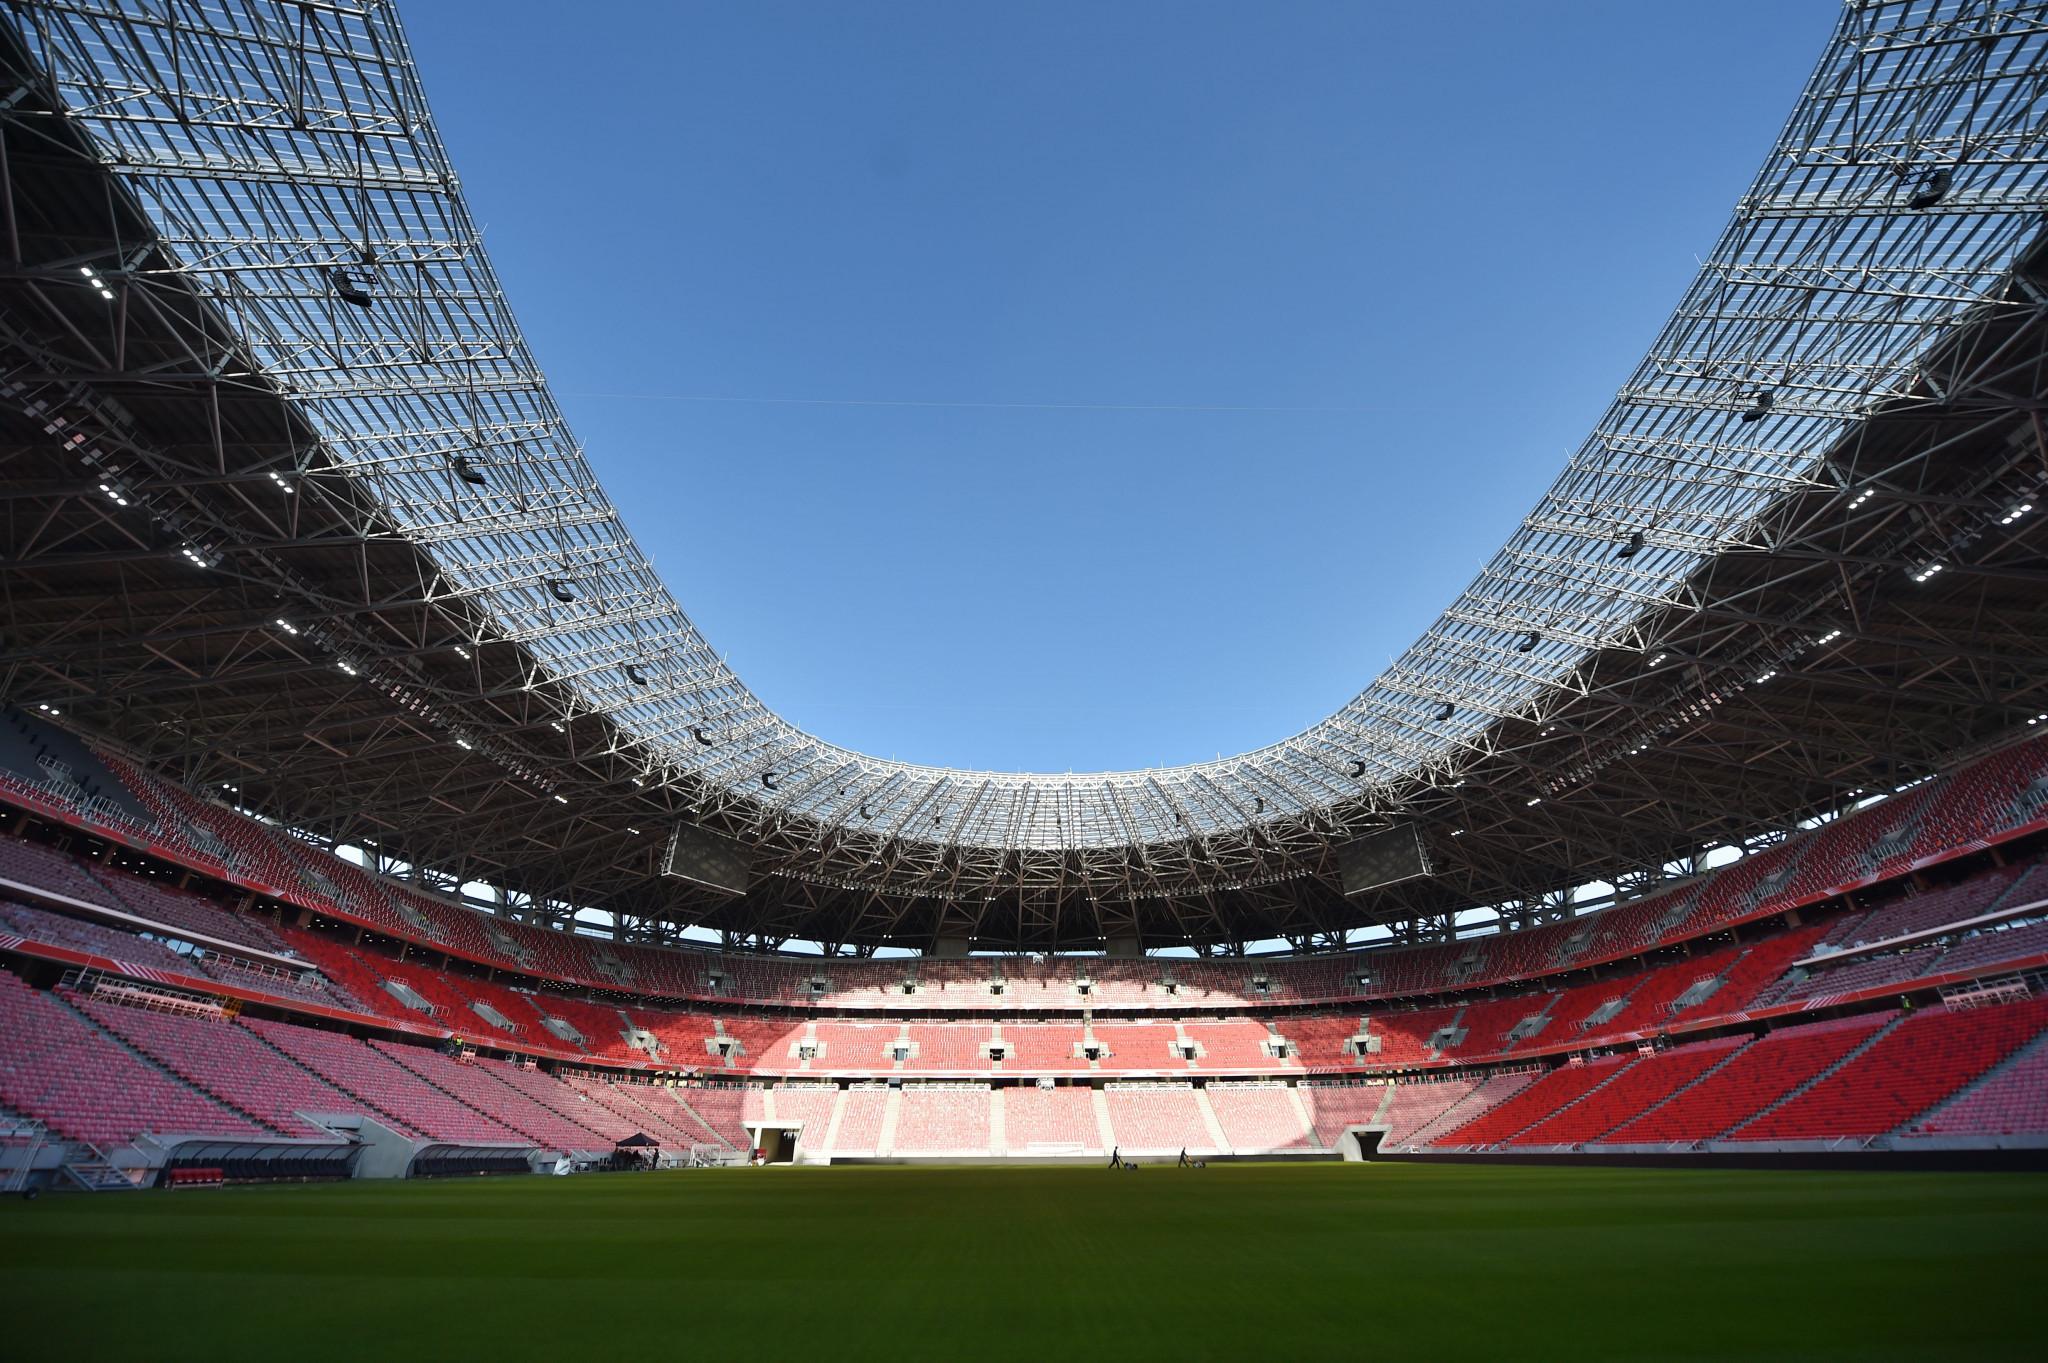 Puskás Aréna will host the 2022 UEFA Europa League final ©Getty Images